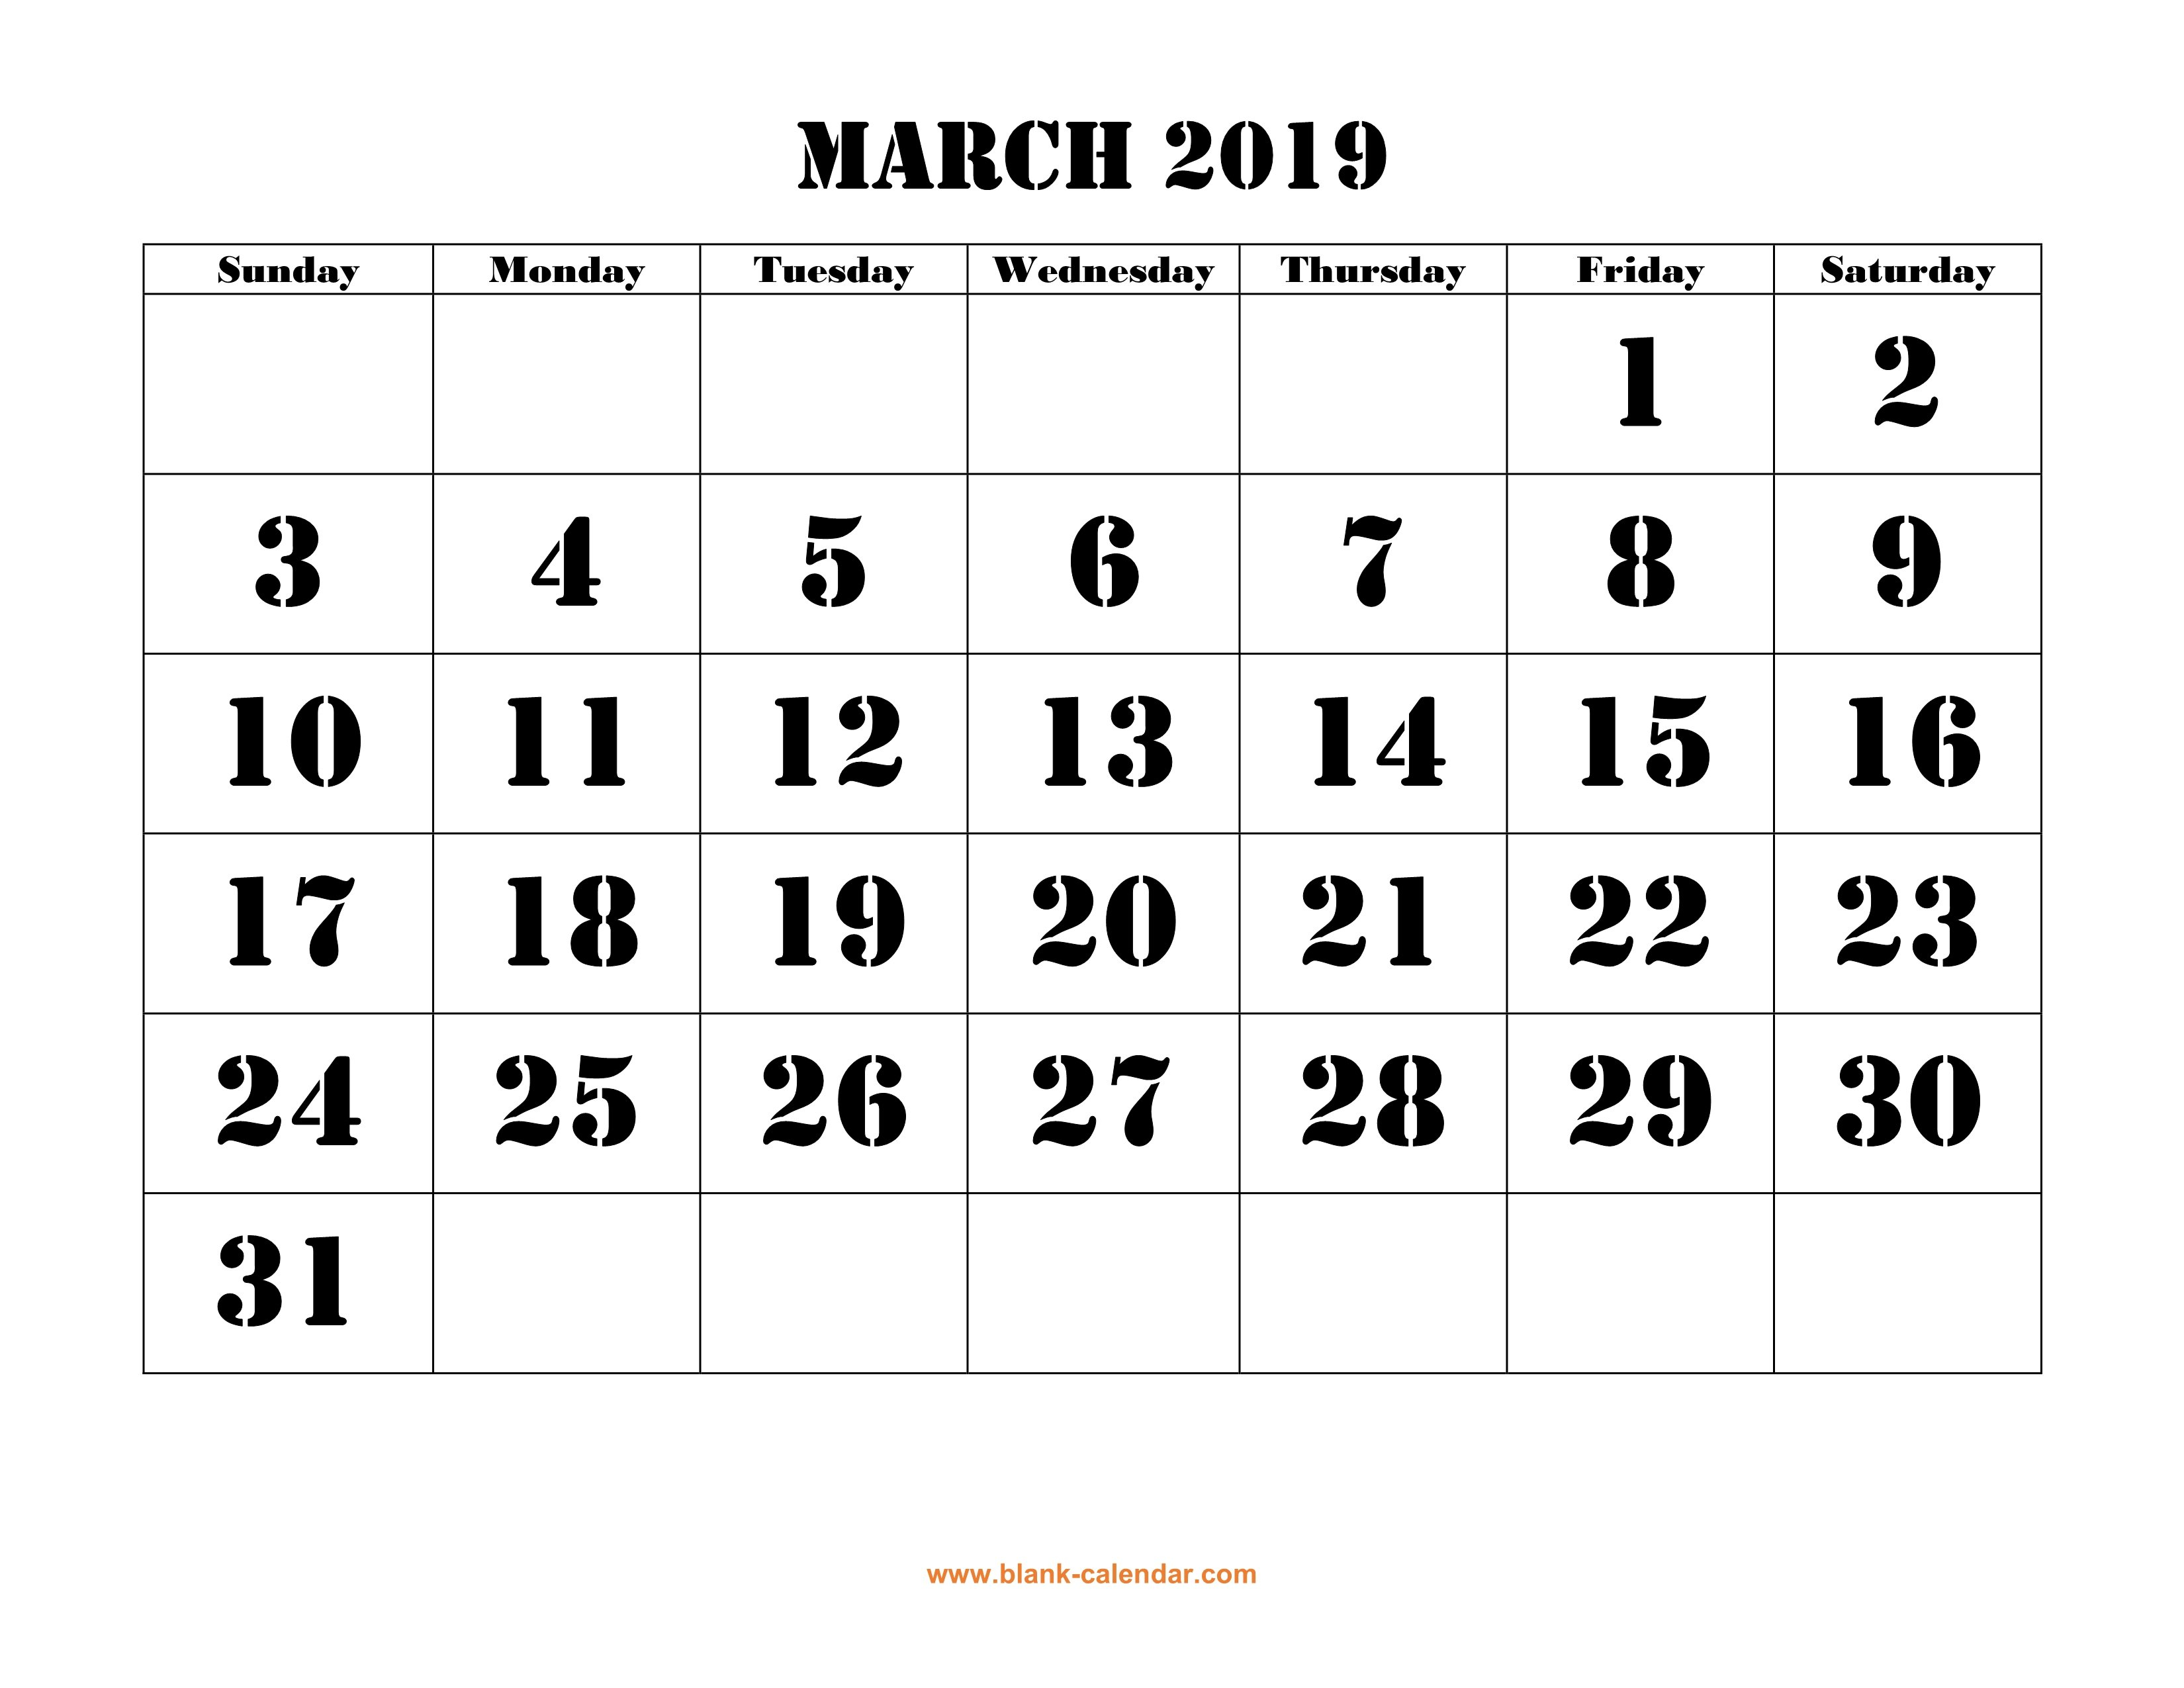 Free Download Printable March 2019 Calendar, Large Font Design March 8 2019 Calendar